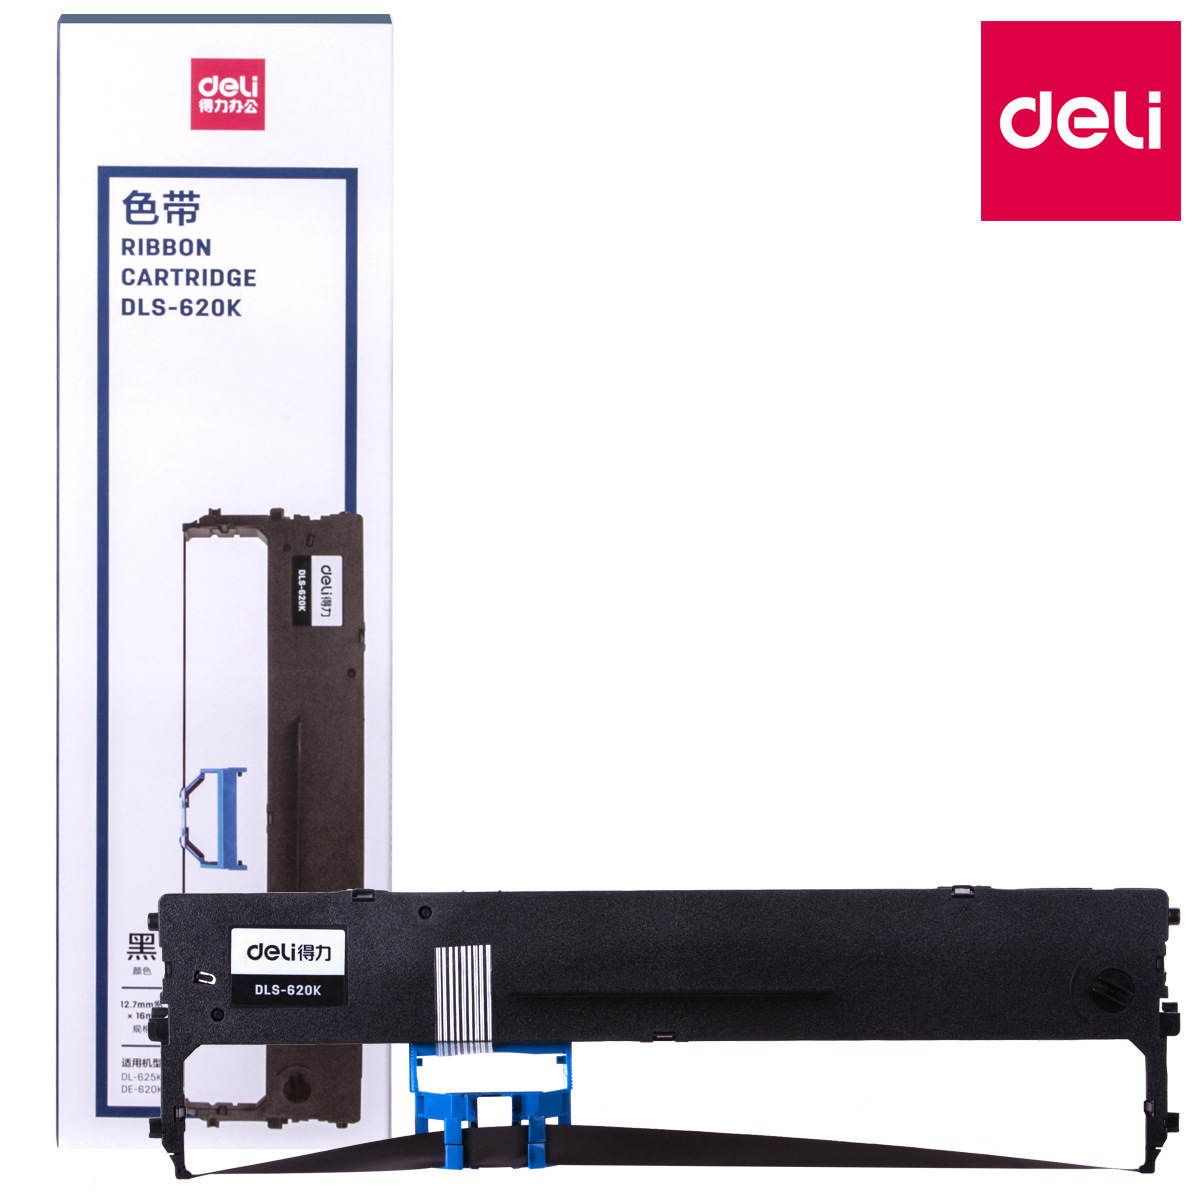 Deli dls-620k is suitable for 620k printer needle type original de-620k ribbon rack + ribbon core